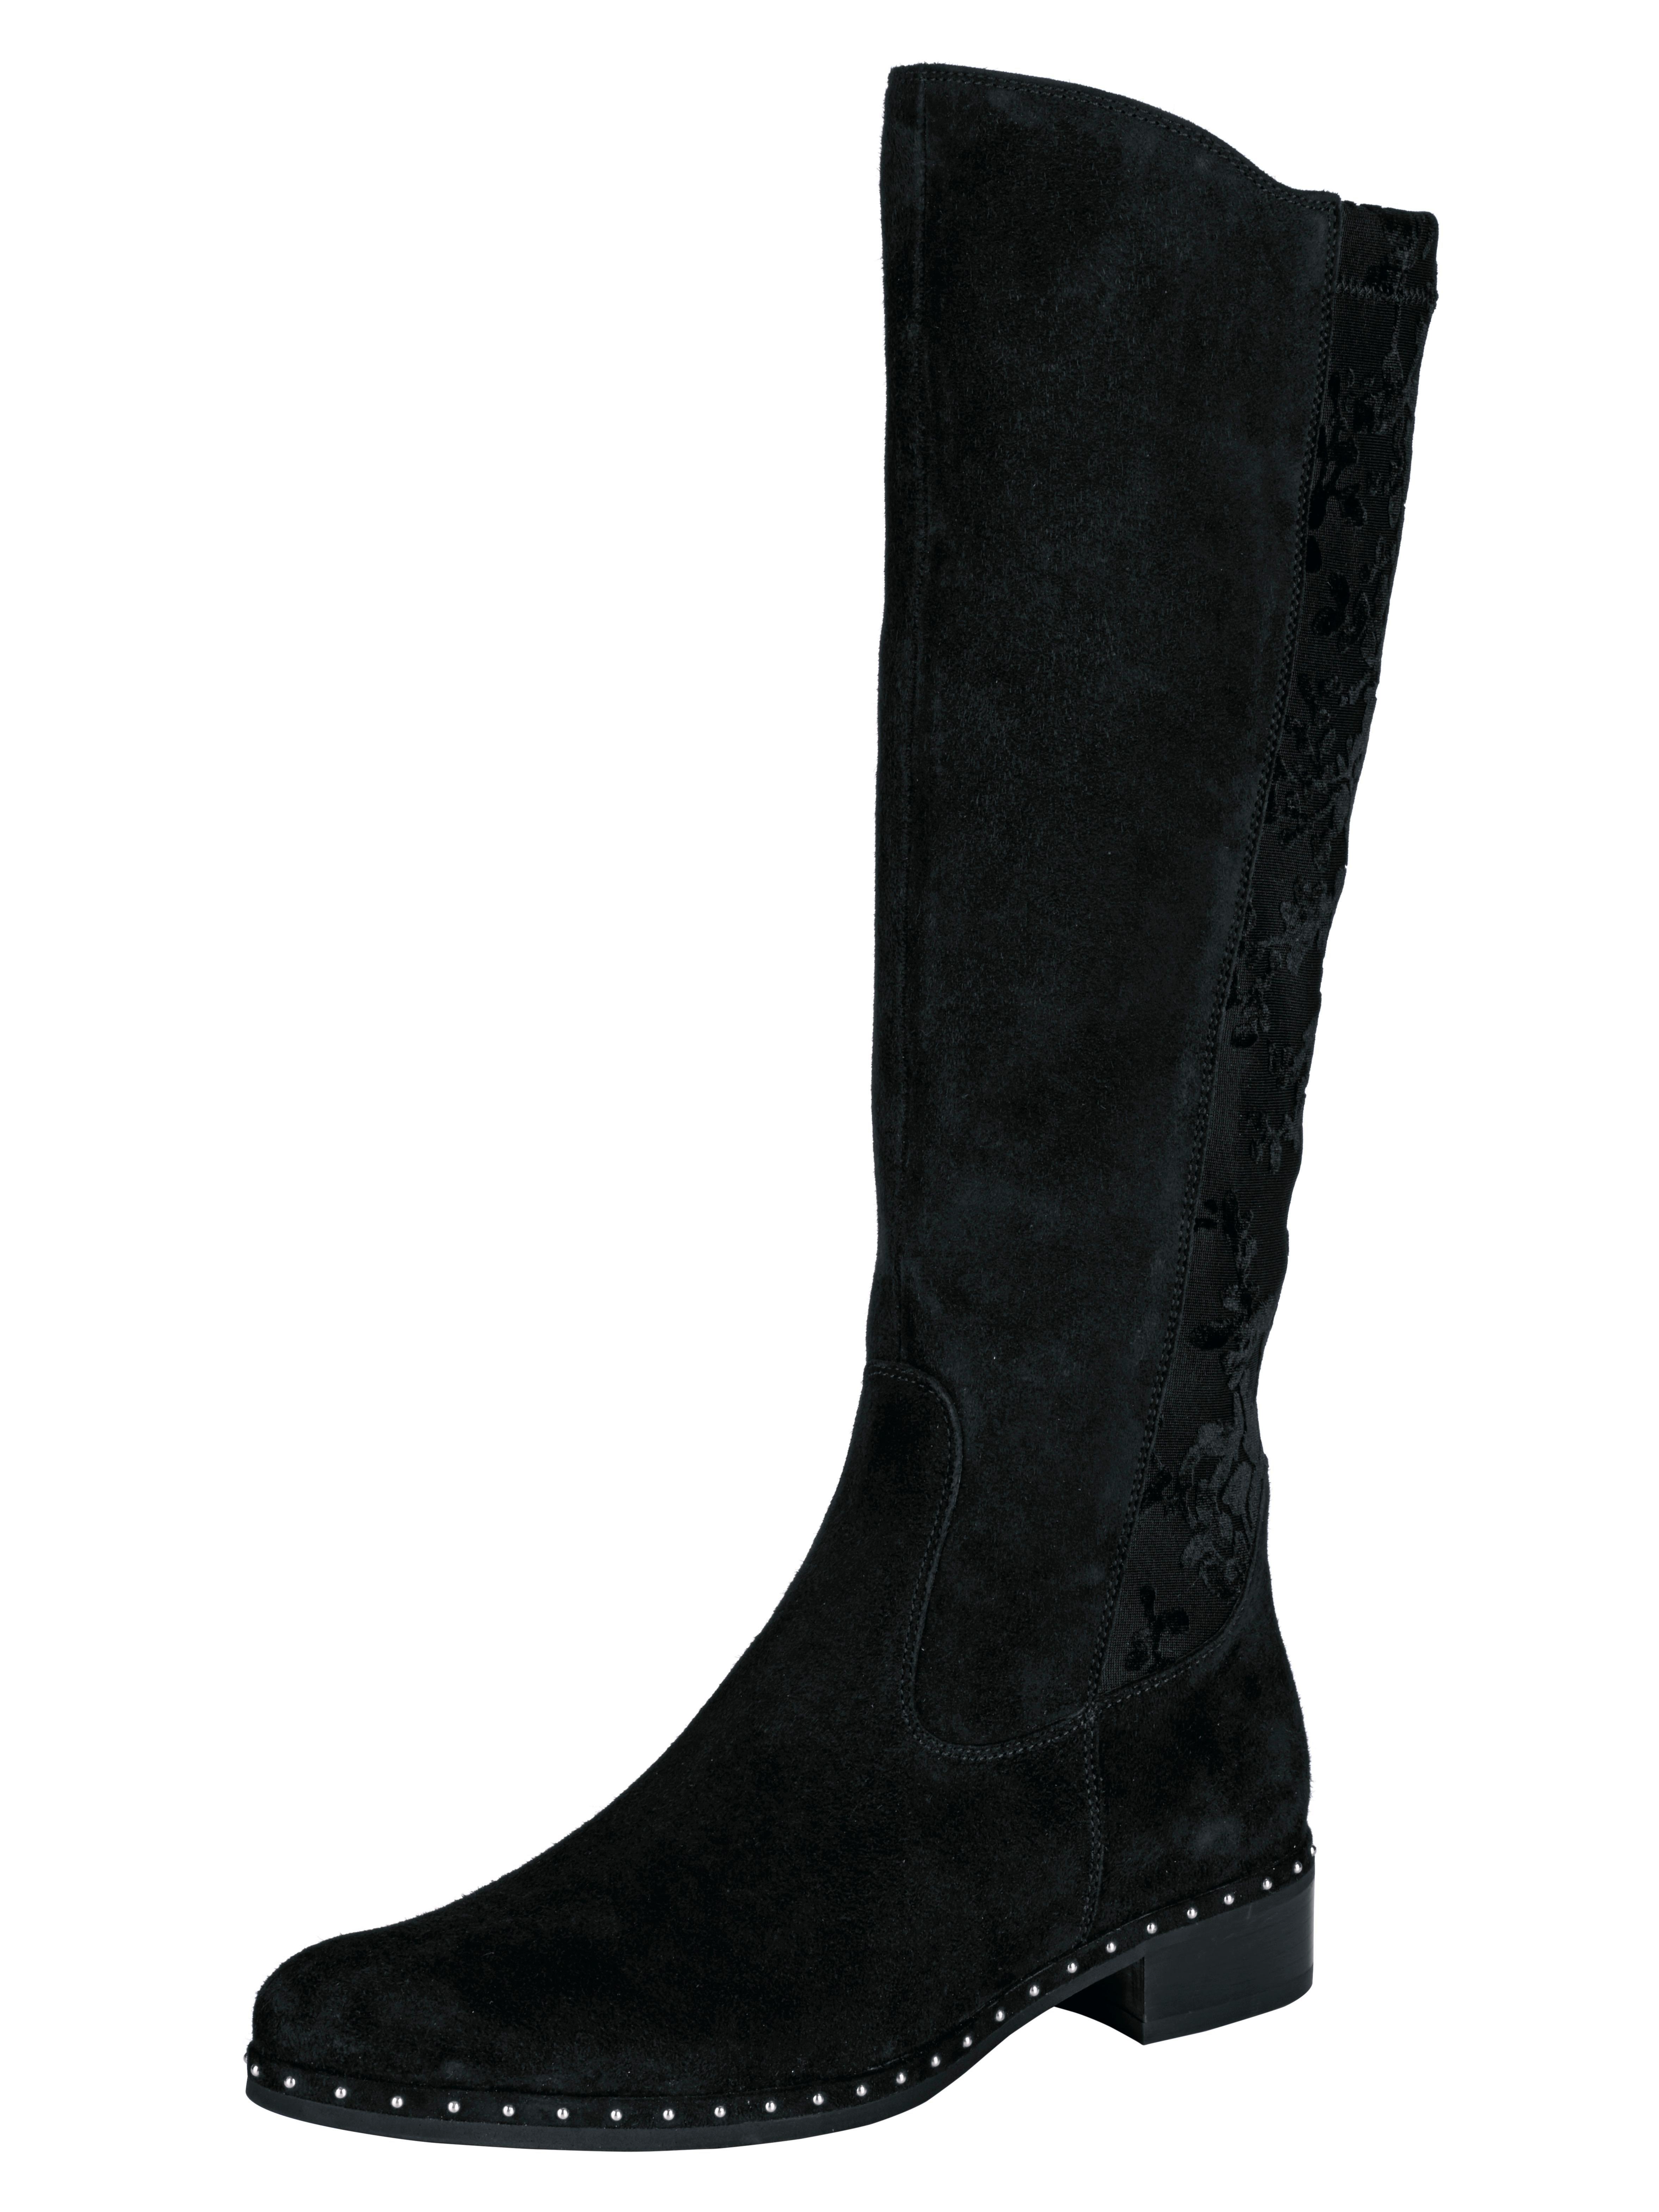 Online Laarzen Online Bestellen Nu Bestellen Nu Laarzen Laarzen vm0ynw8NO